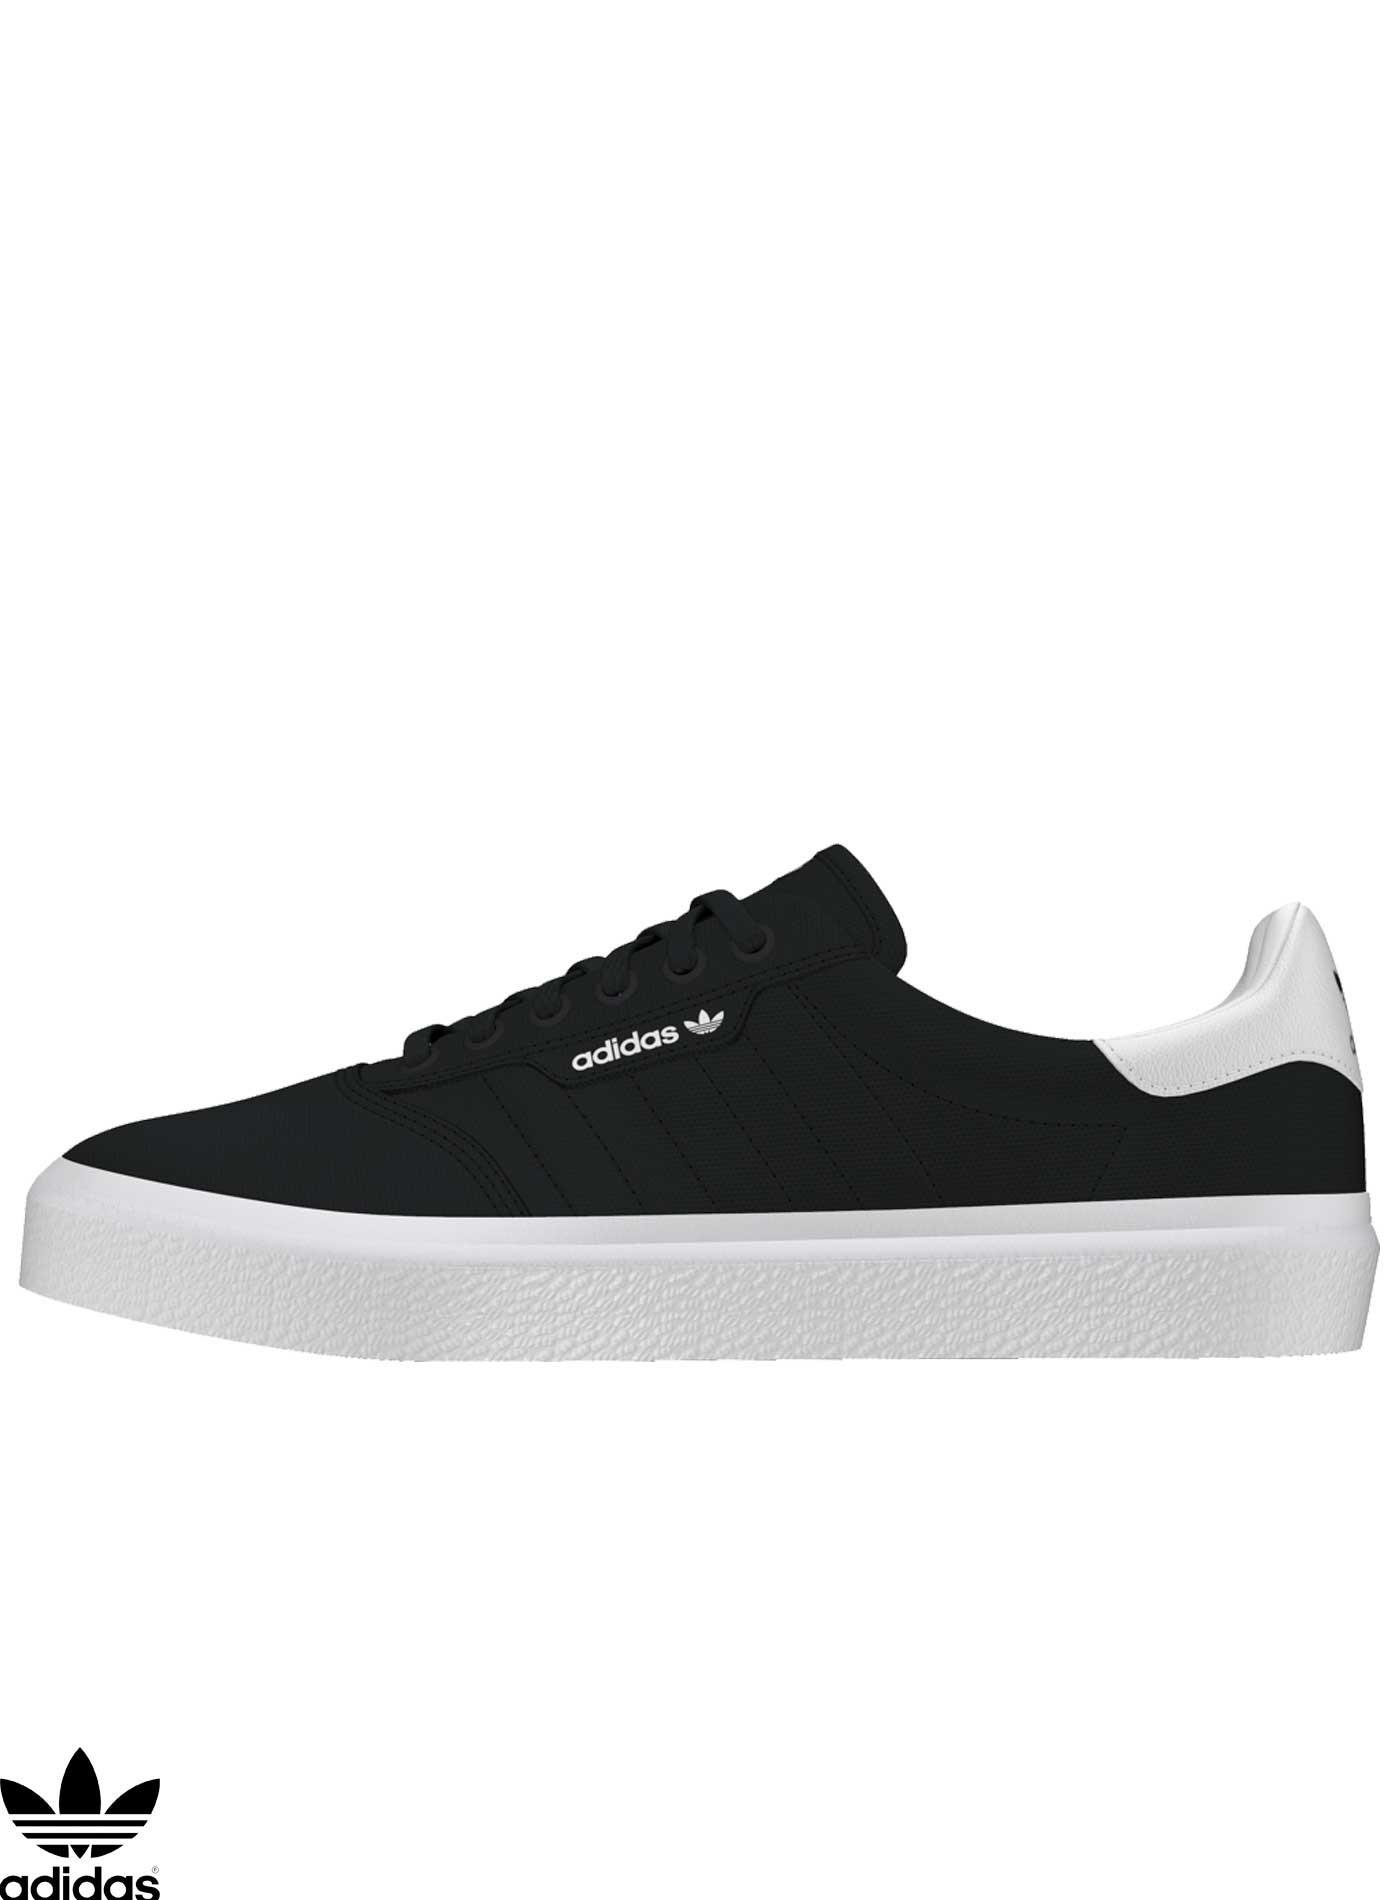 Scarpe da Skate Adidas 3MC Vulc Black